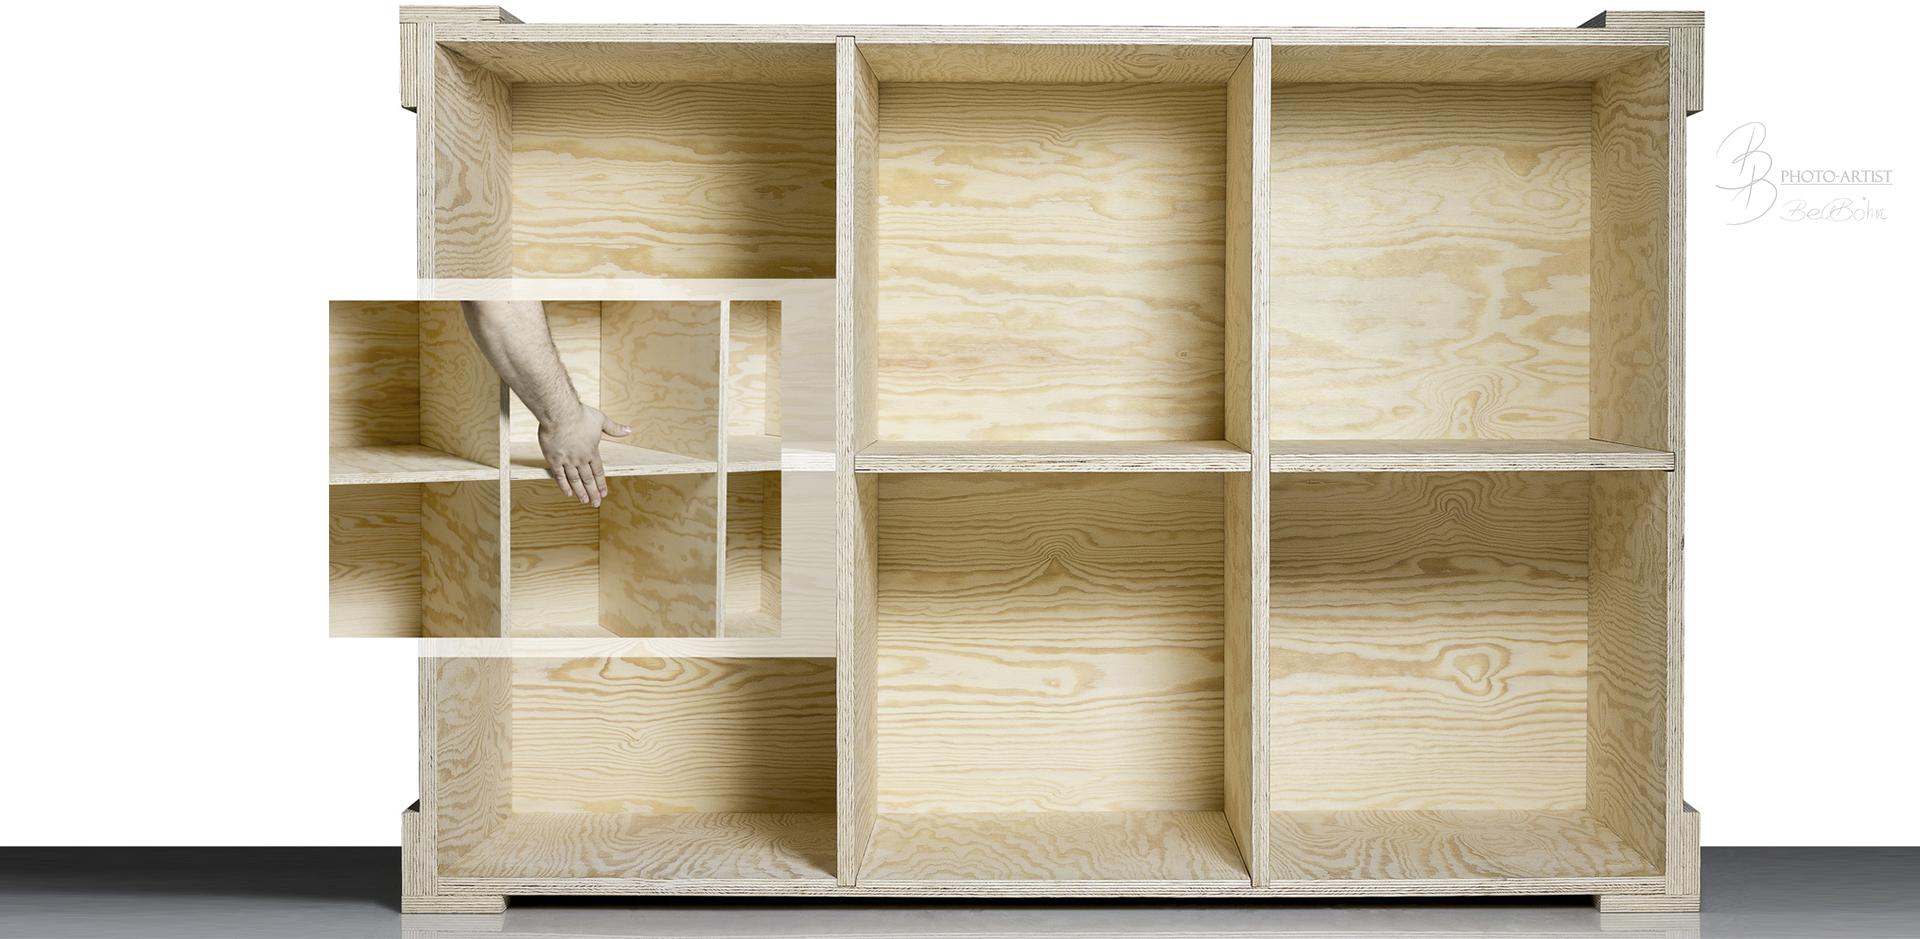 19 Sideboard